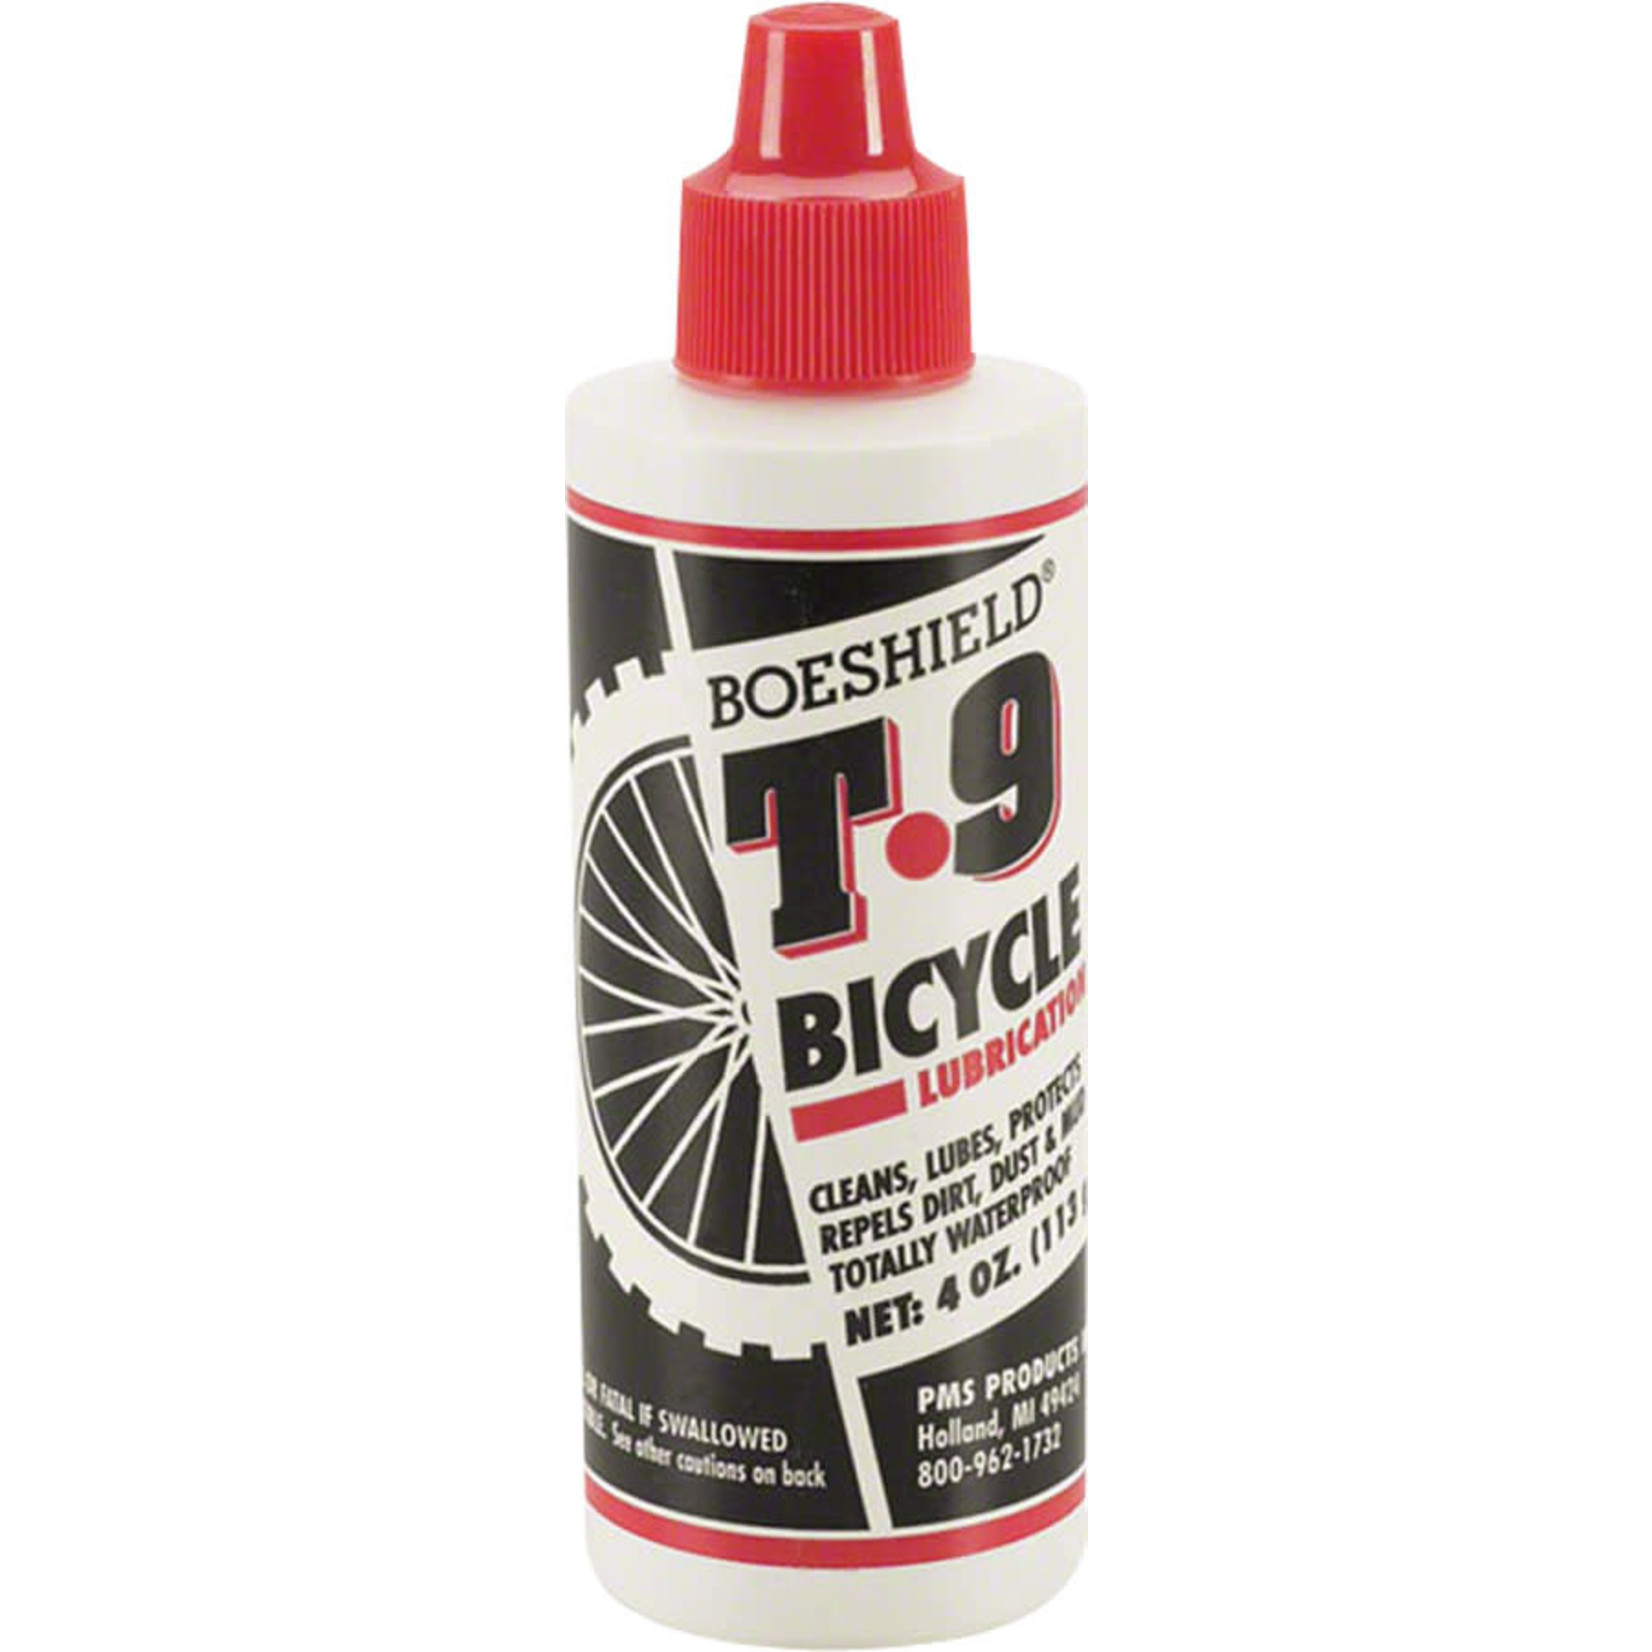 Boeshield Boeshield T9 Chain Lube Squeeze Bottle: 4oz